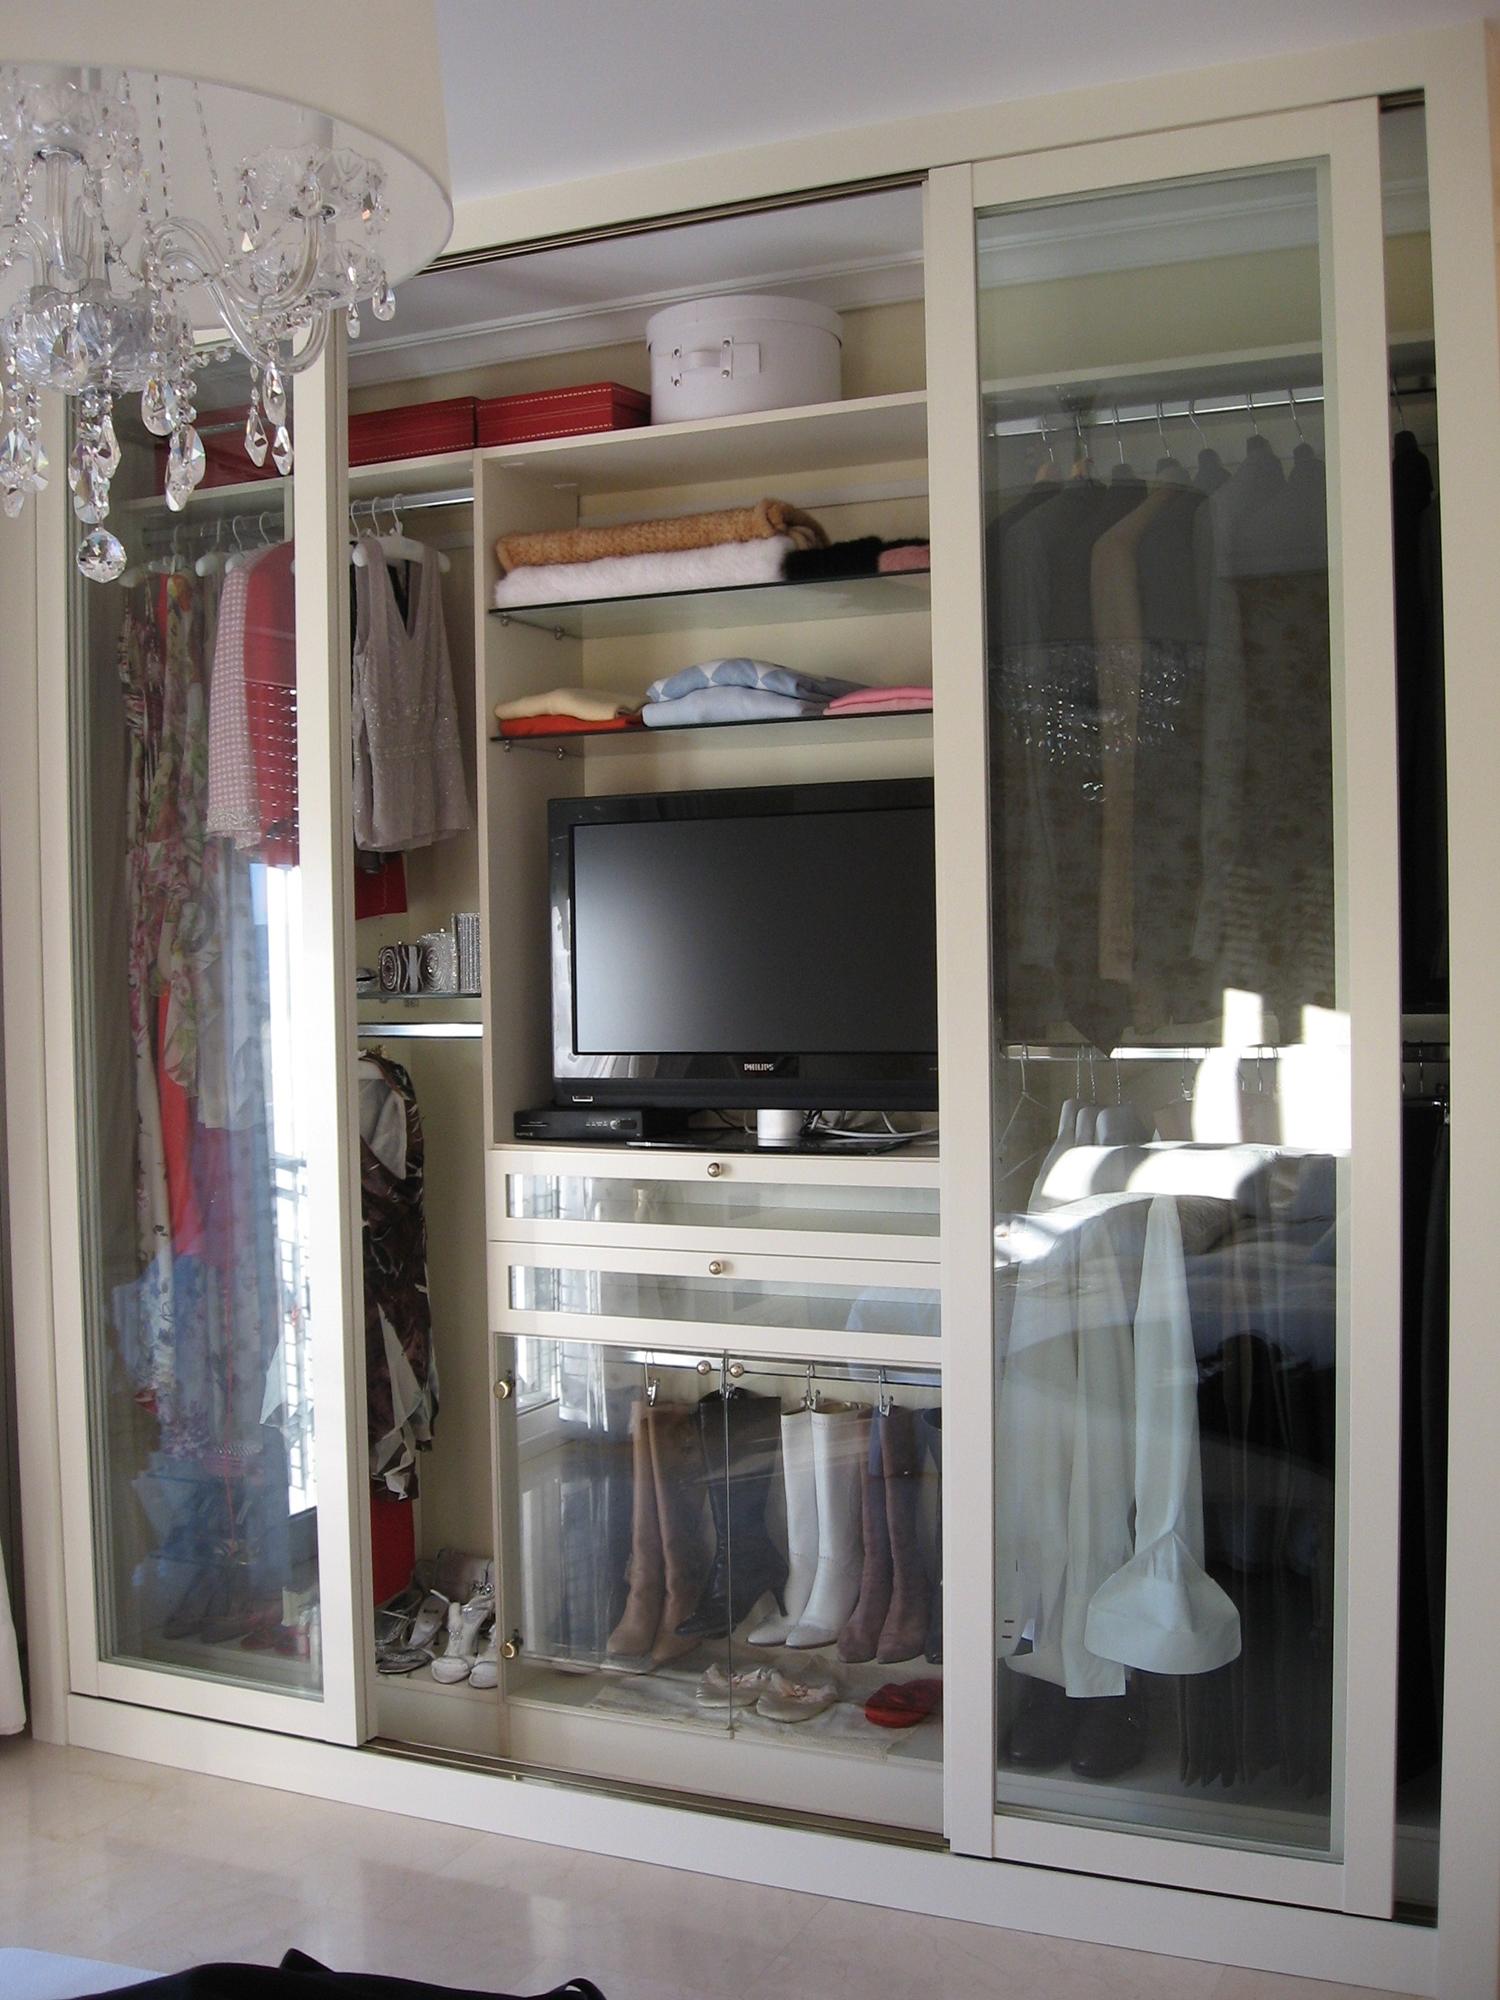 Dise o de armarios empotrados metrocloset for Puertas de corredera para dormitorio